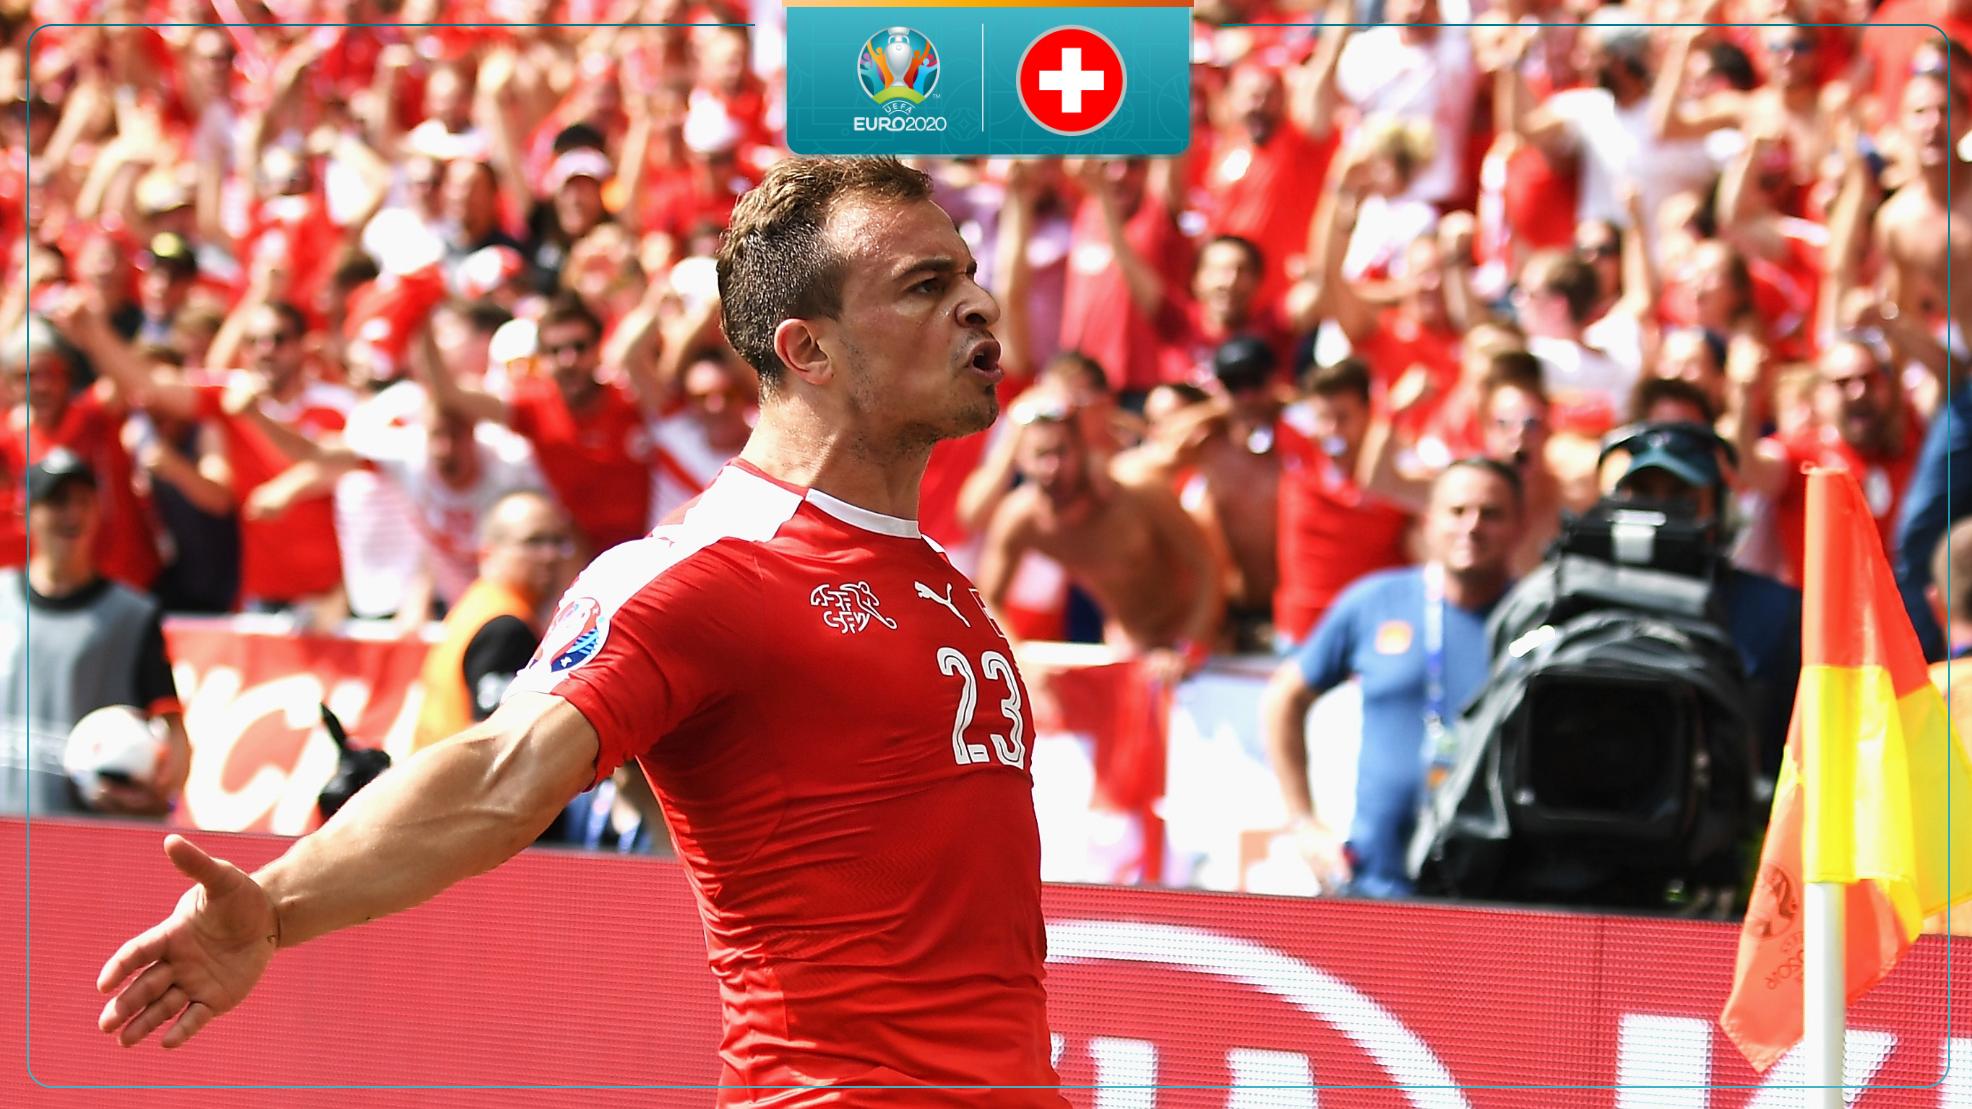 EURO 2020 contenders: Switzerland